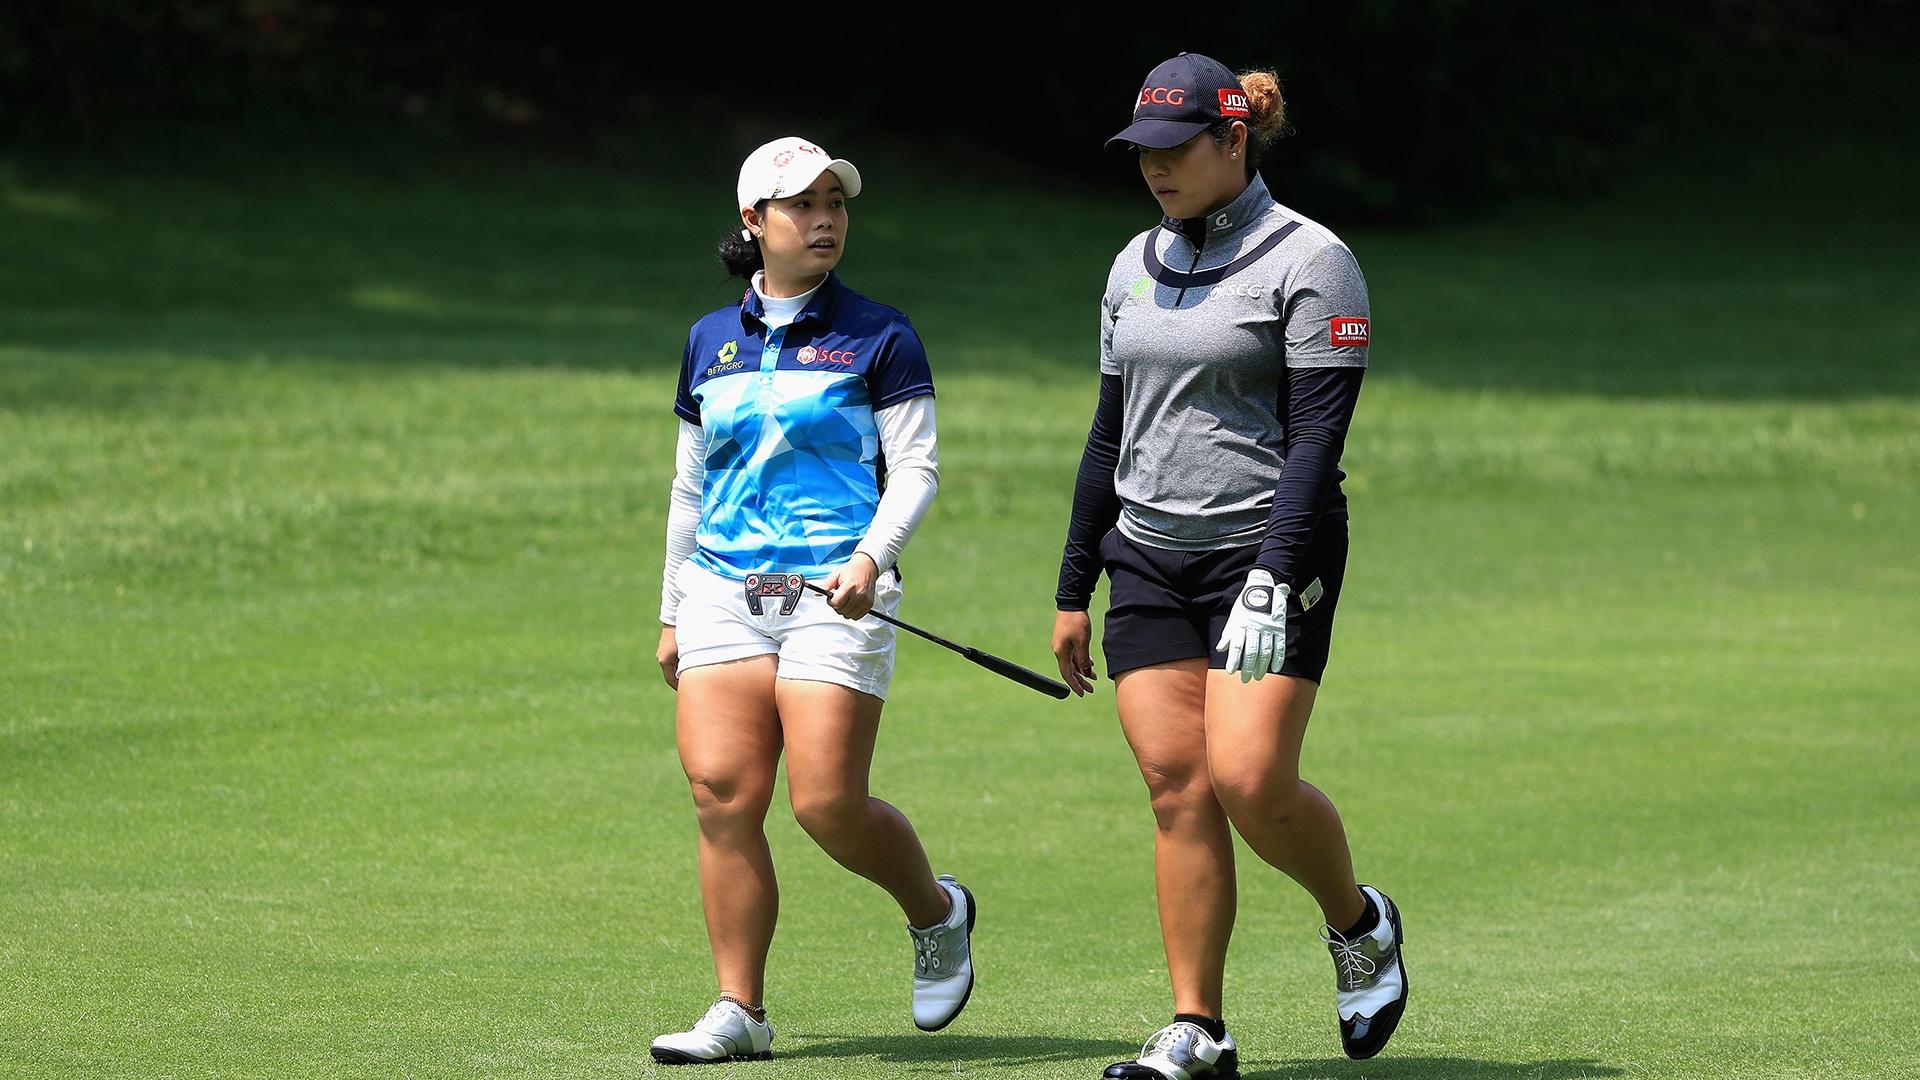 Ariya Jutanugarn Confident In Sister She Can Win This Year Golf Channel